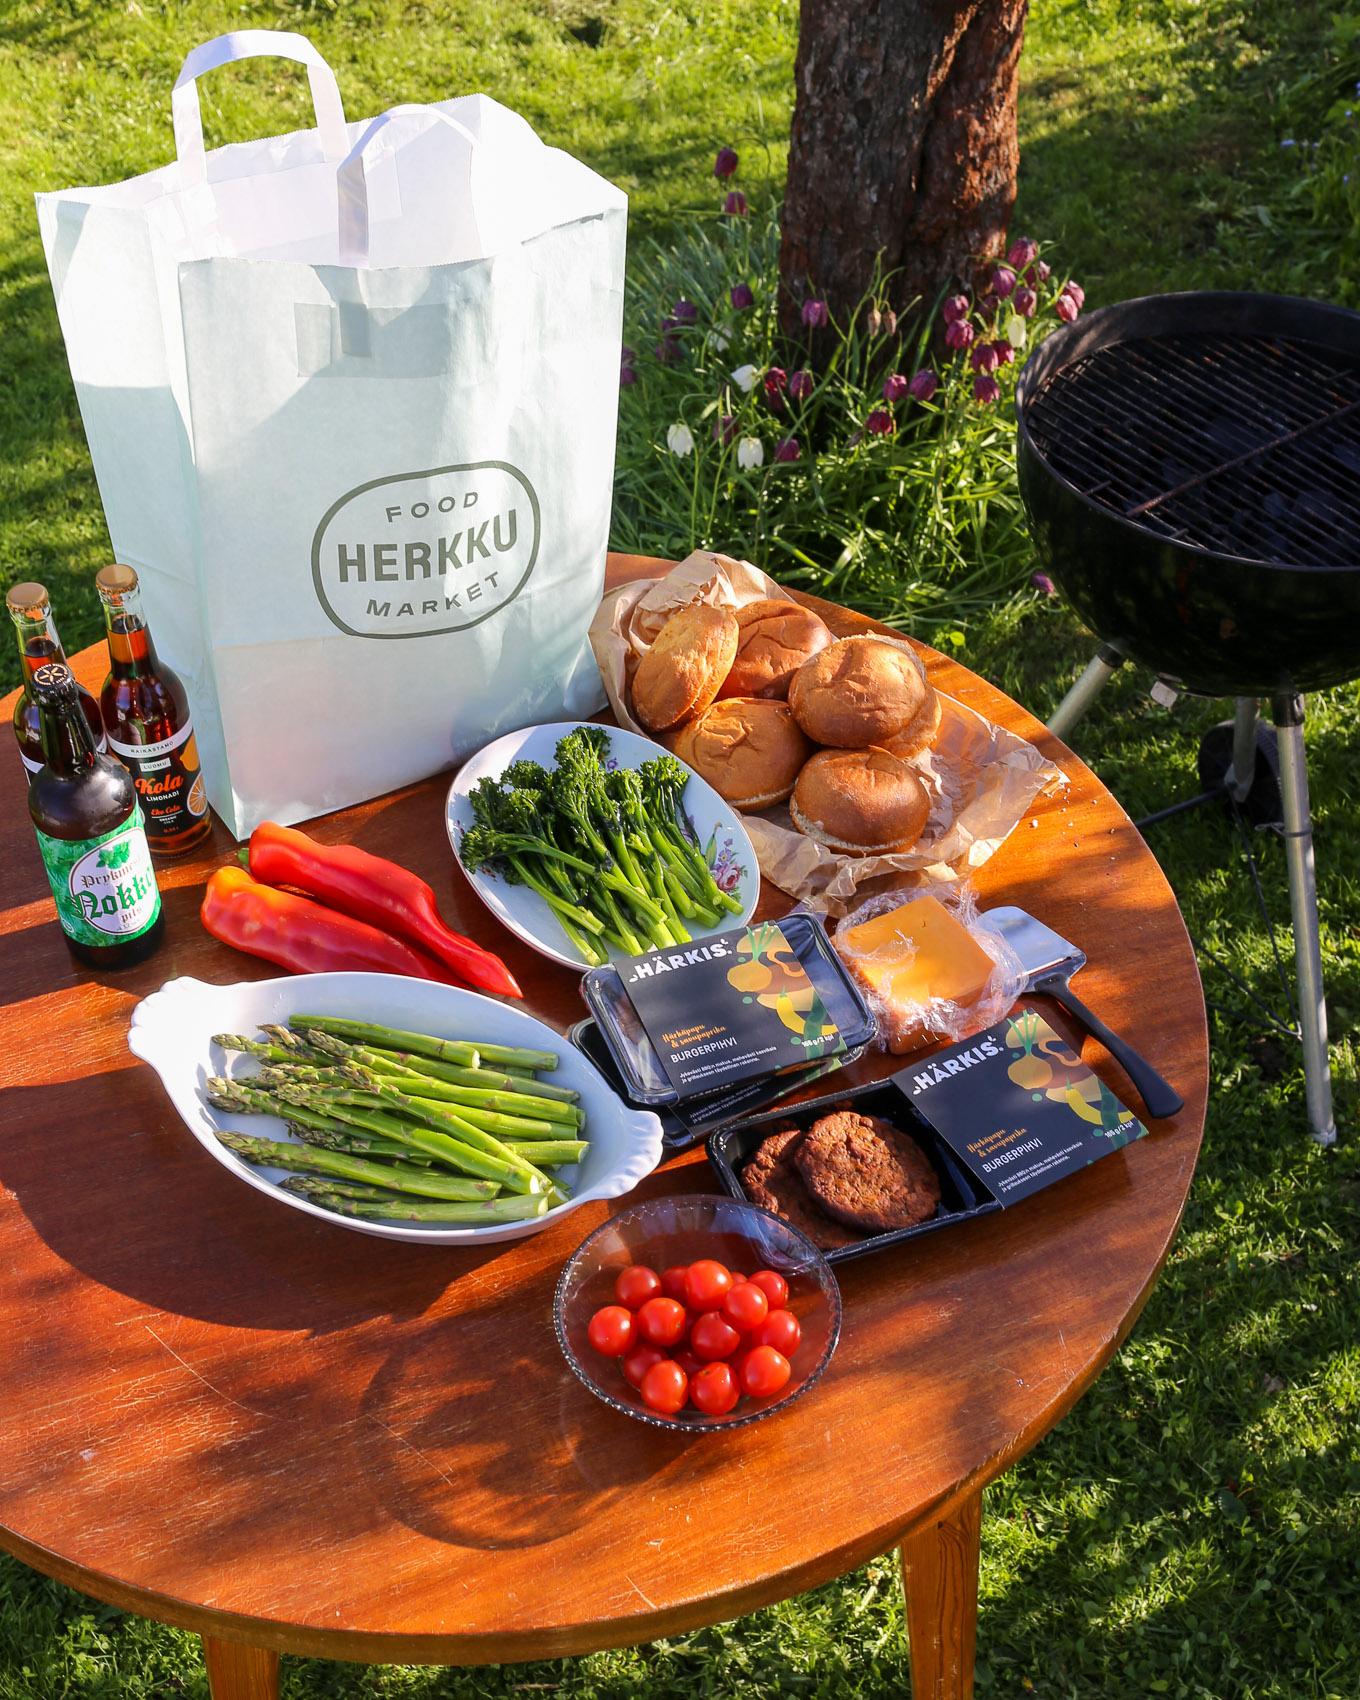 Food Market Herkku - Grillikausi